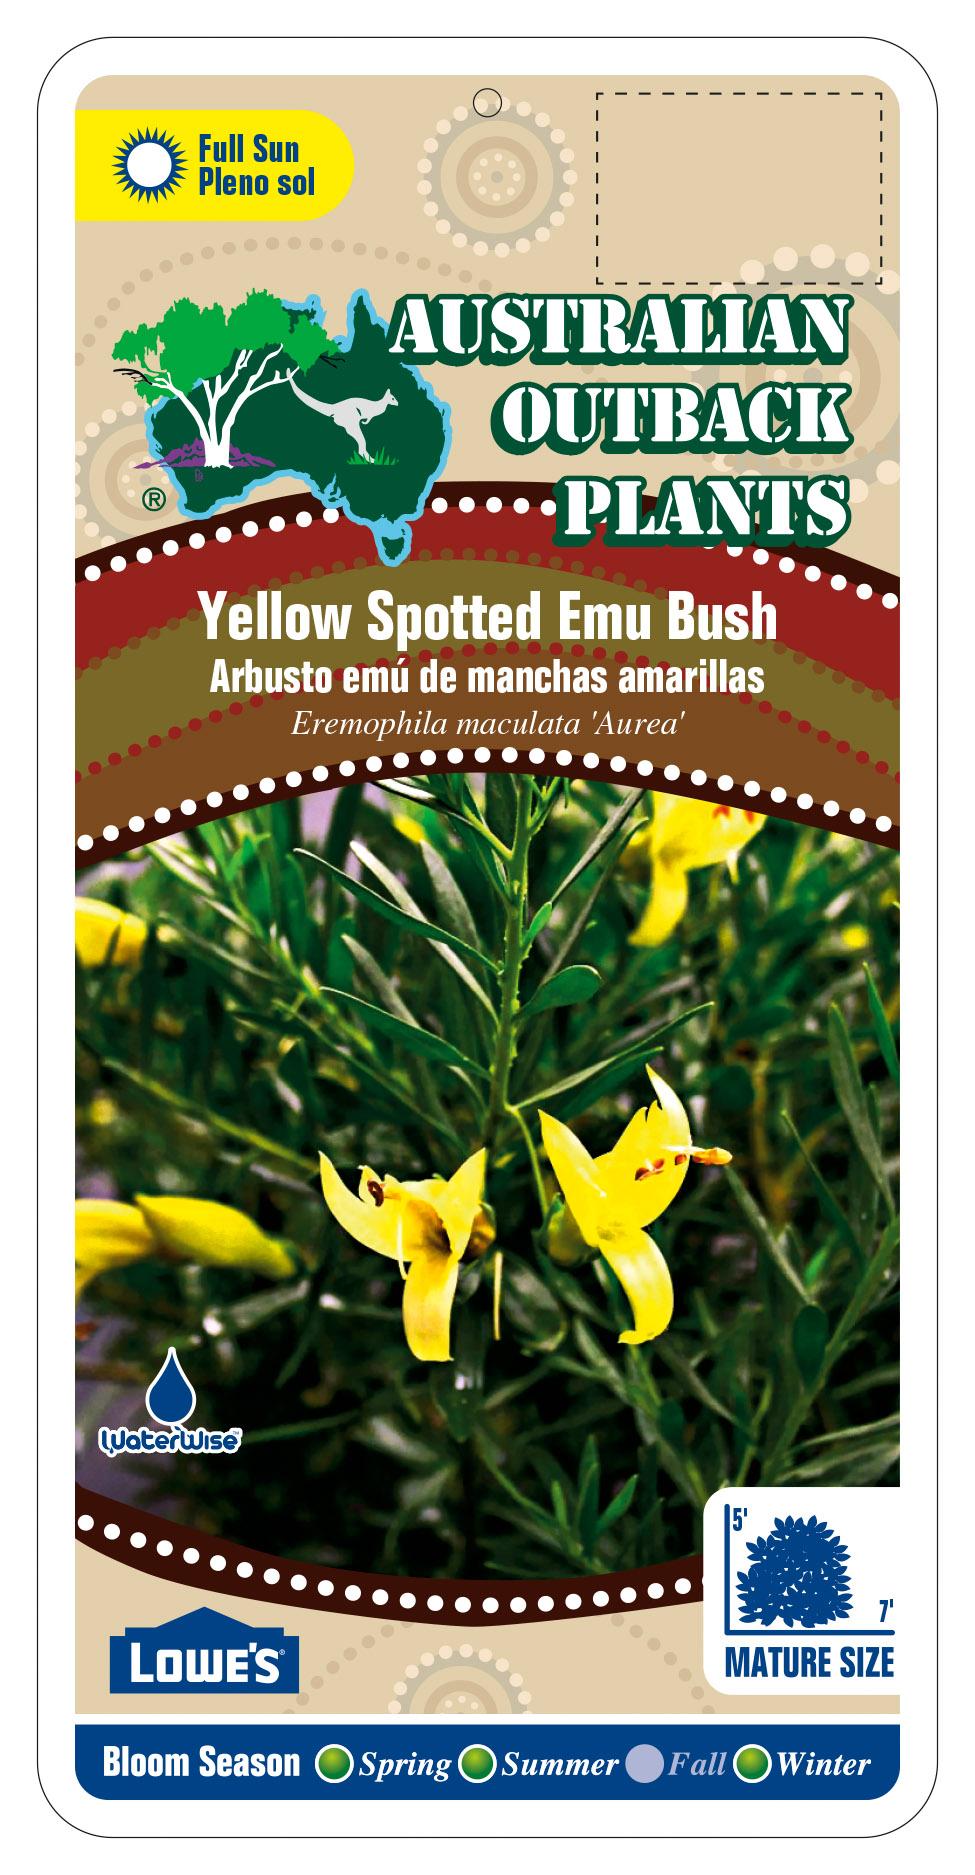 256010_FRONT-Yellow-Spotted-Emu-Bush.jpg